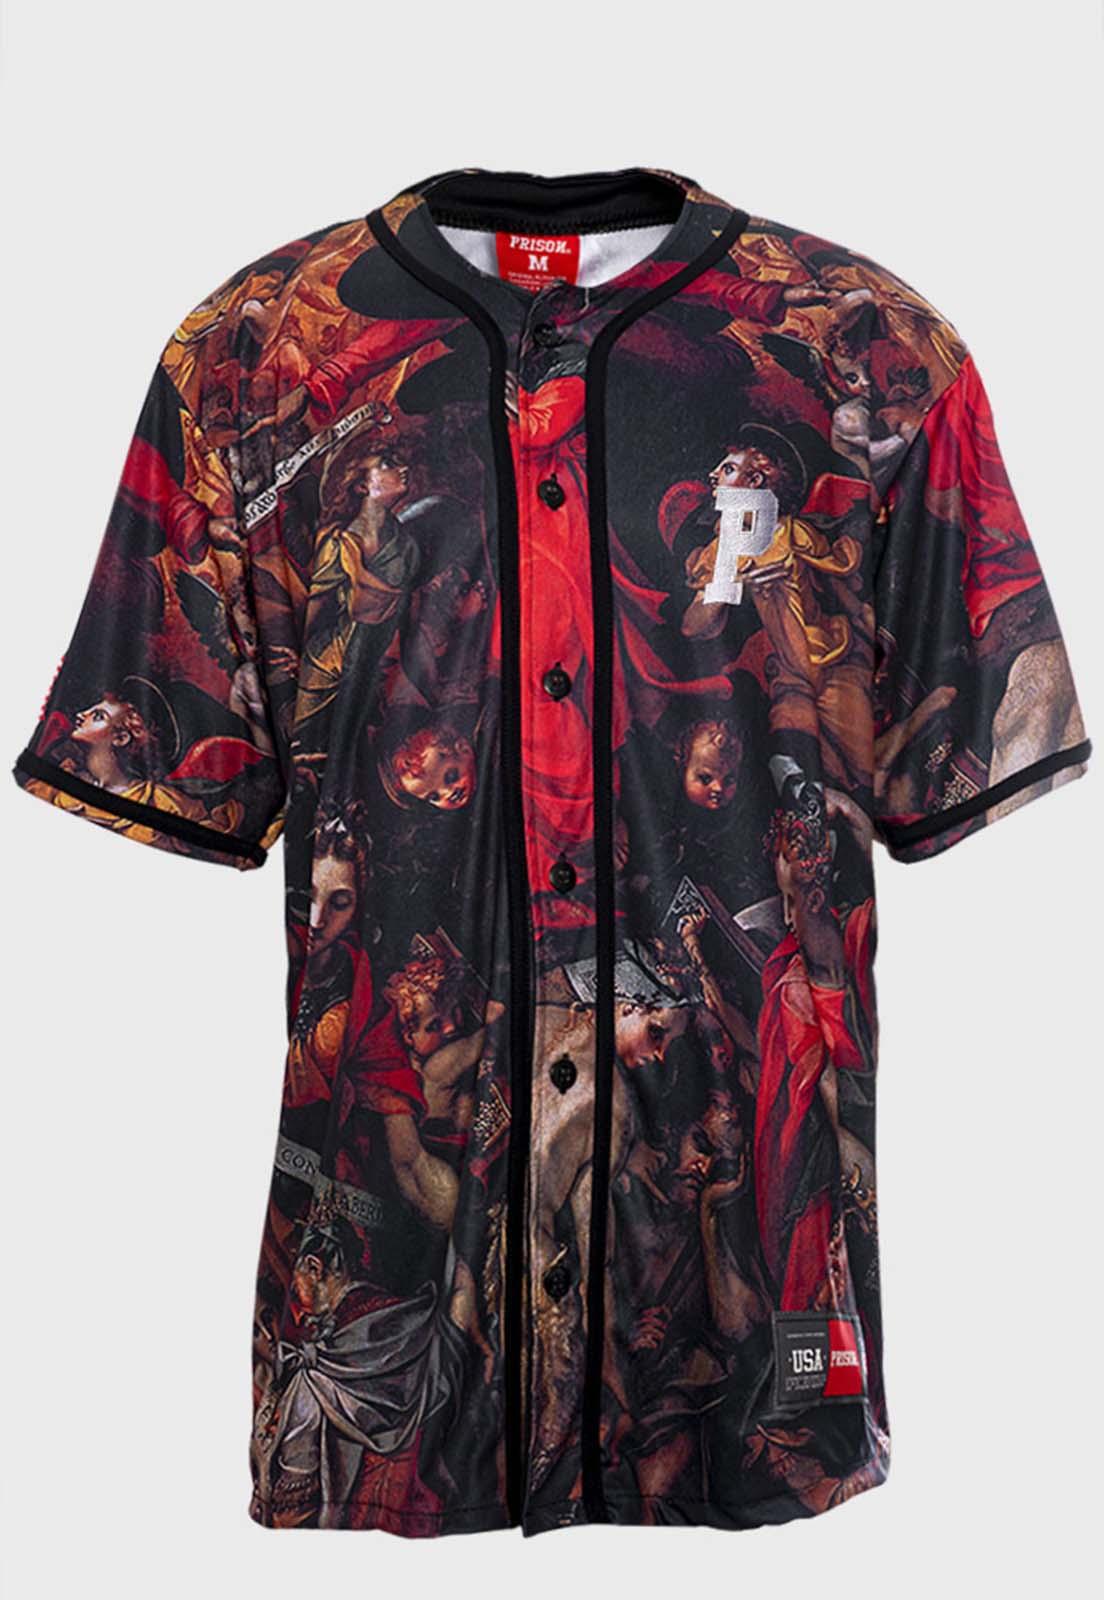 Camisa de Baseball Prison Original's Angel